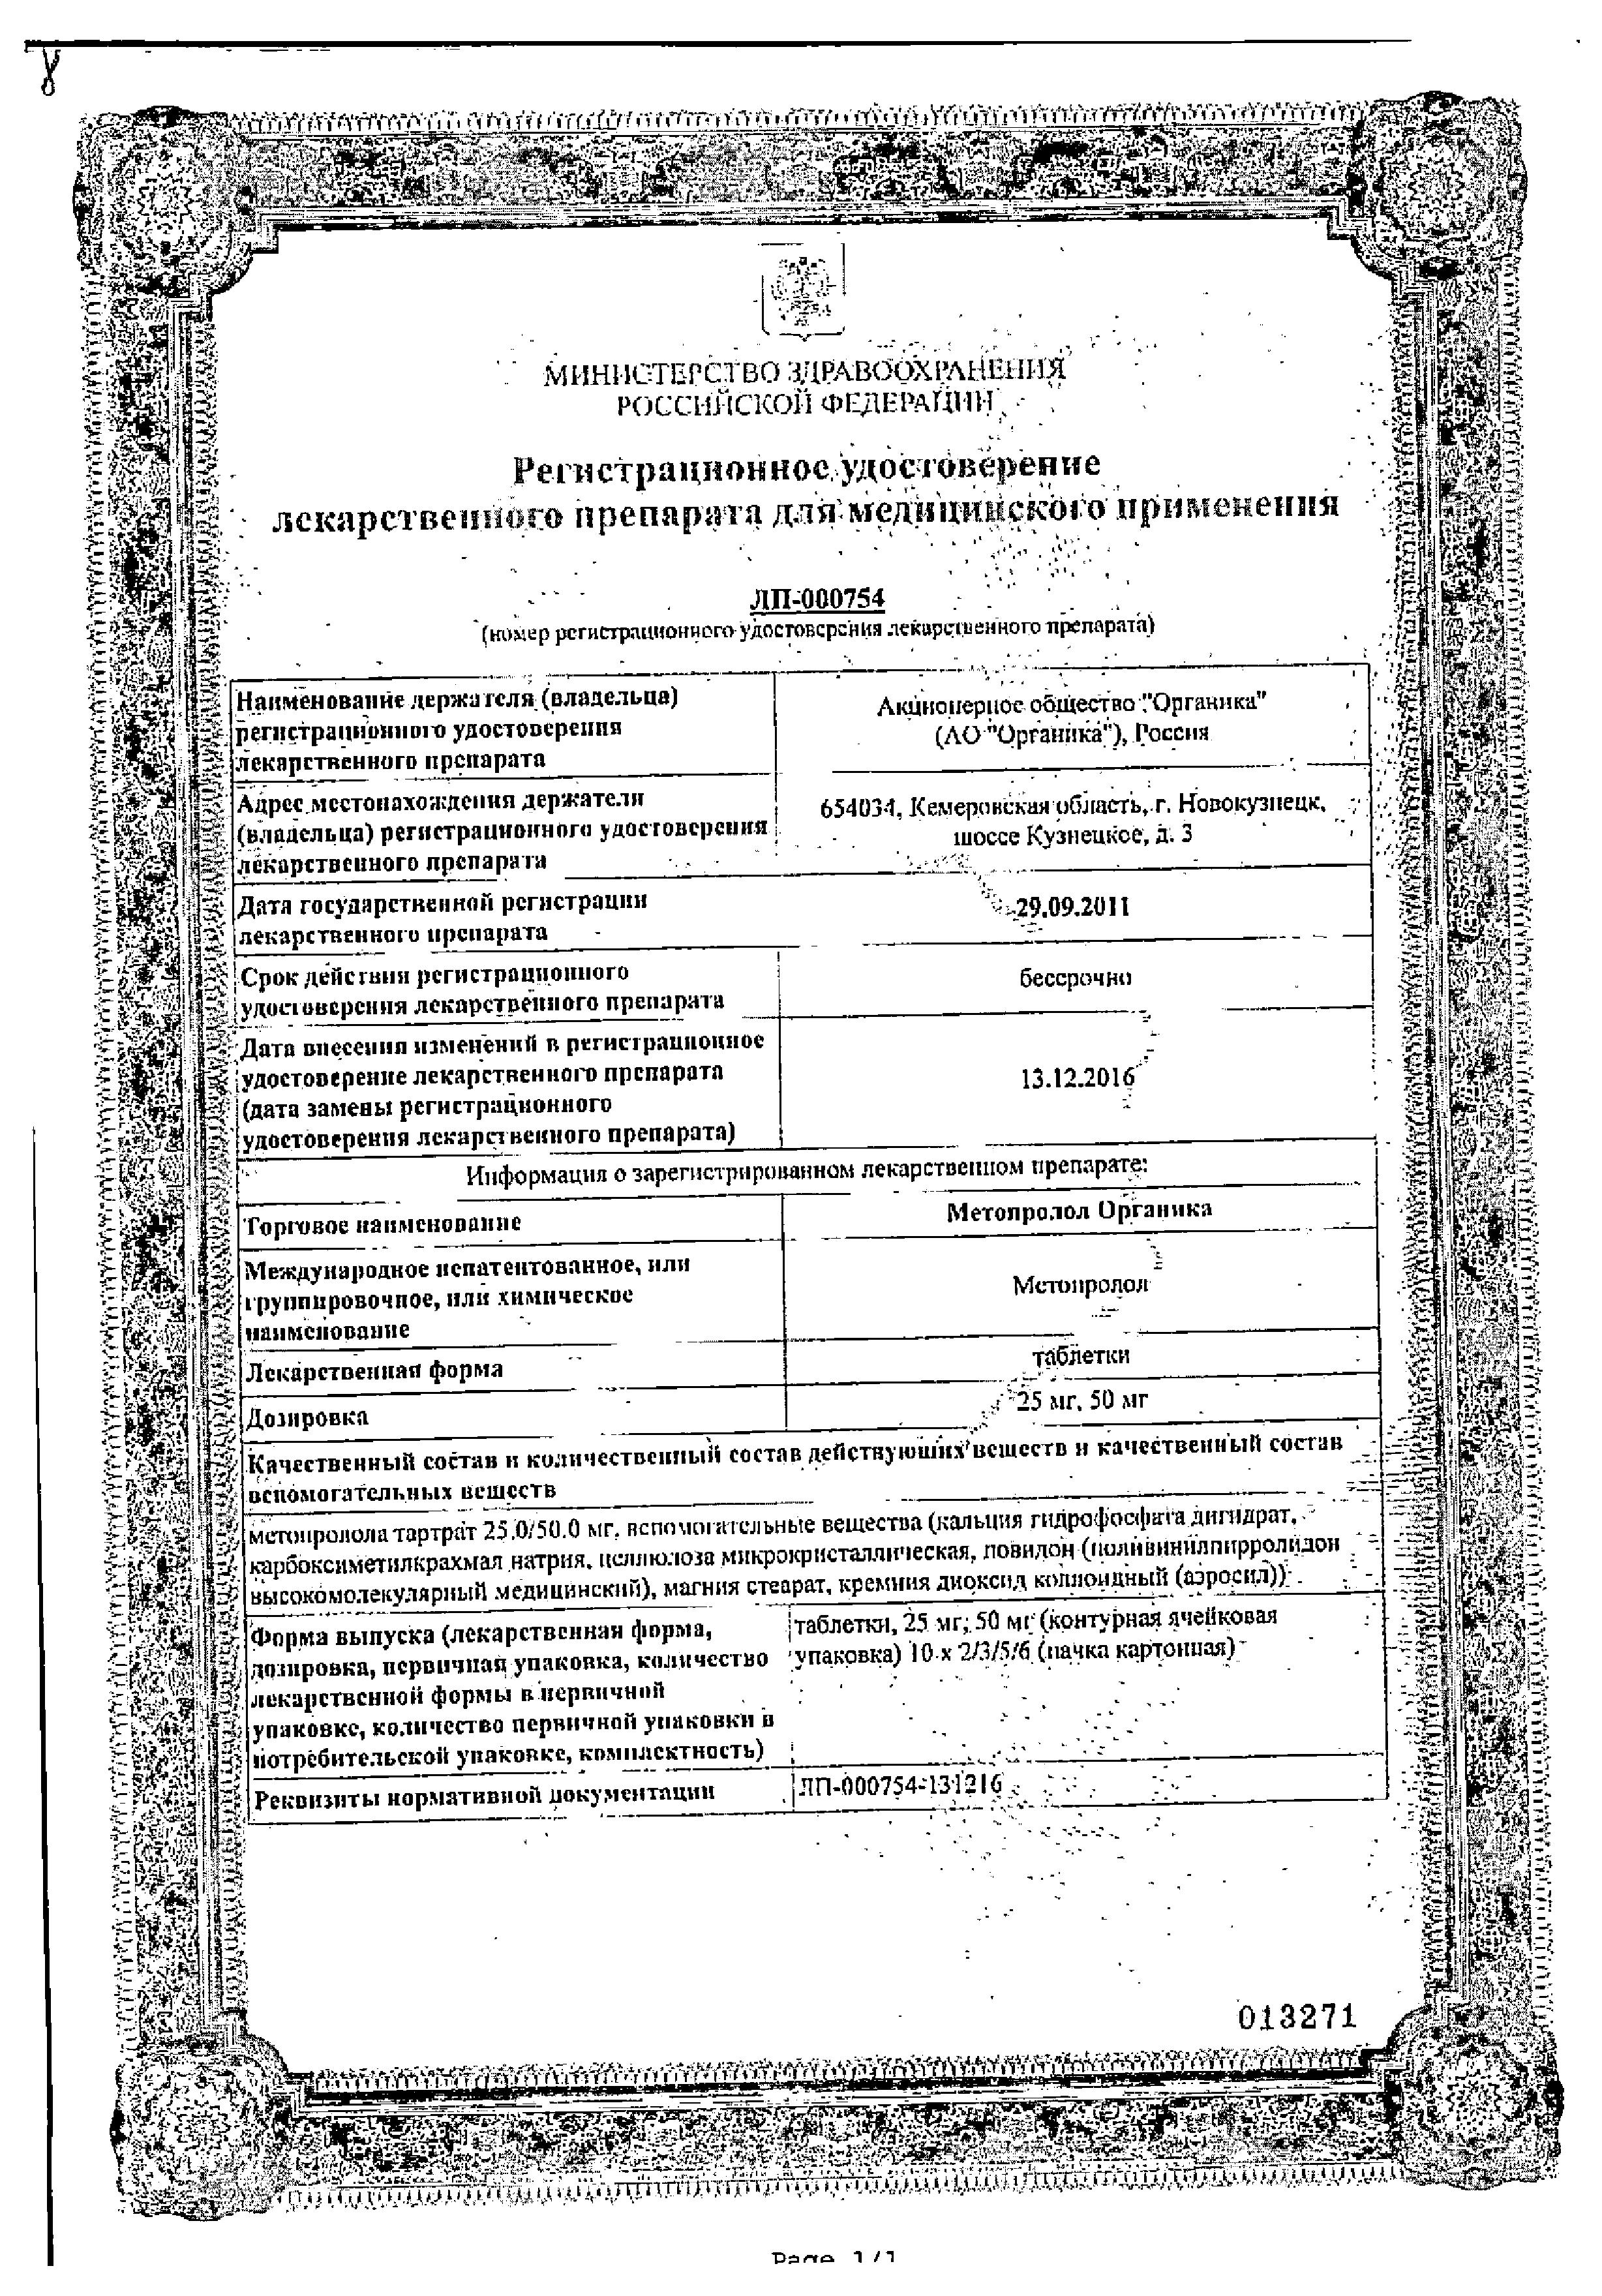 Метопролол Органика сертификат